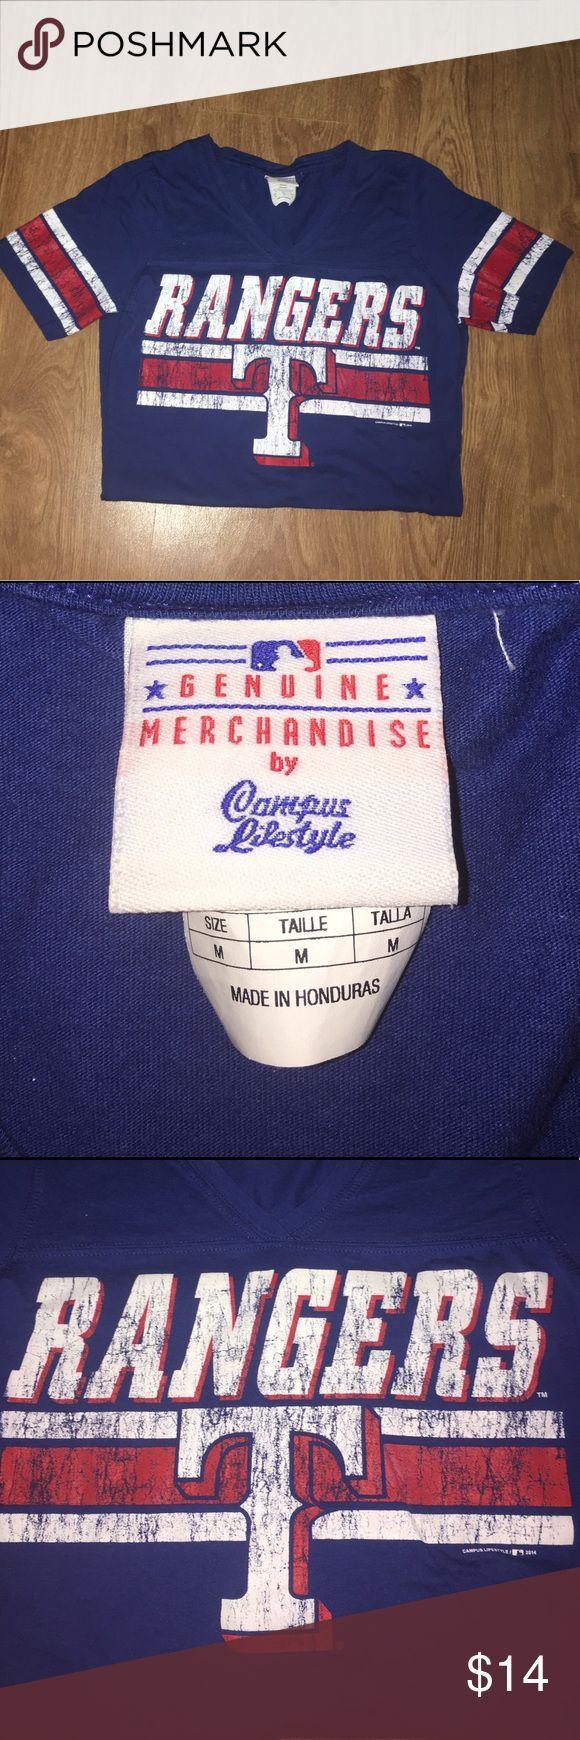 Selling this Texas Rangers T-Shirt on Poshmark! My username is: nerdyandcute. #shopmycloset #poshmark #fashion #shopping #style #forsale #Campus Lifestyle #Tops